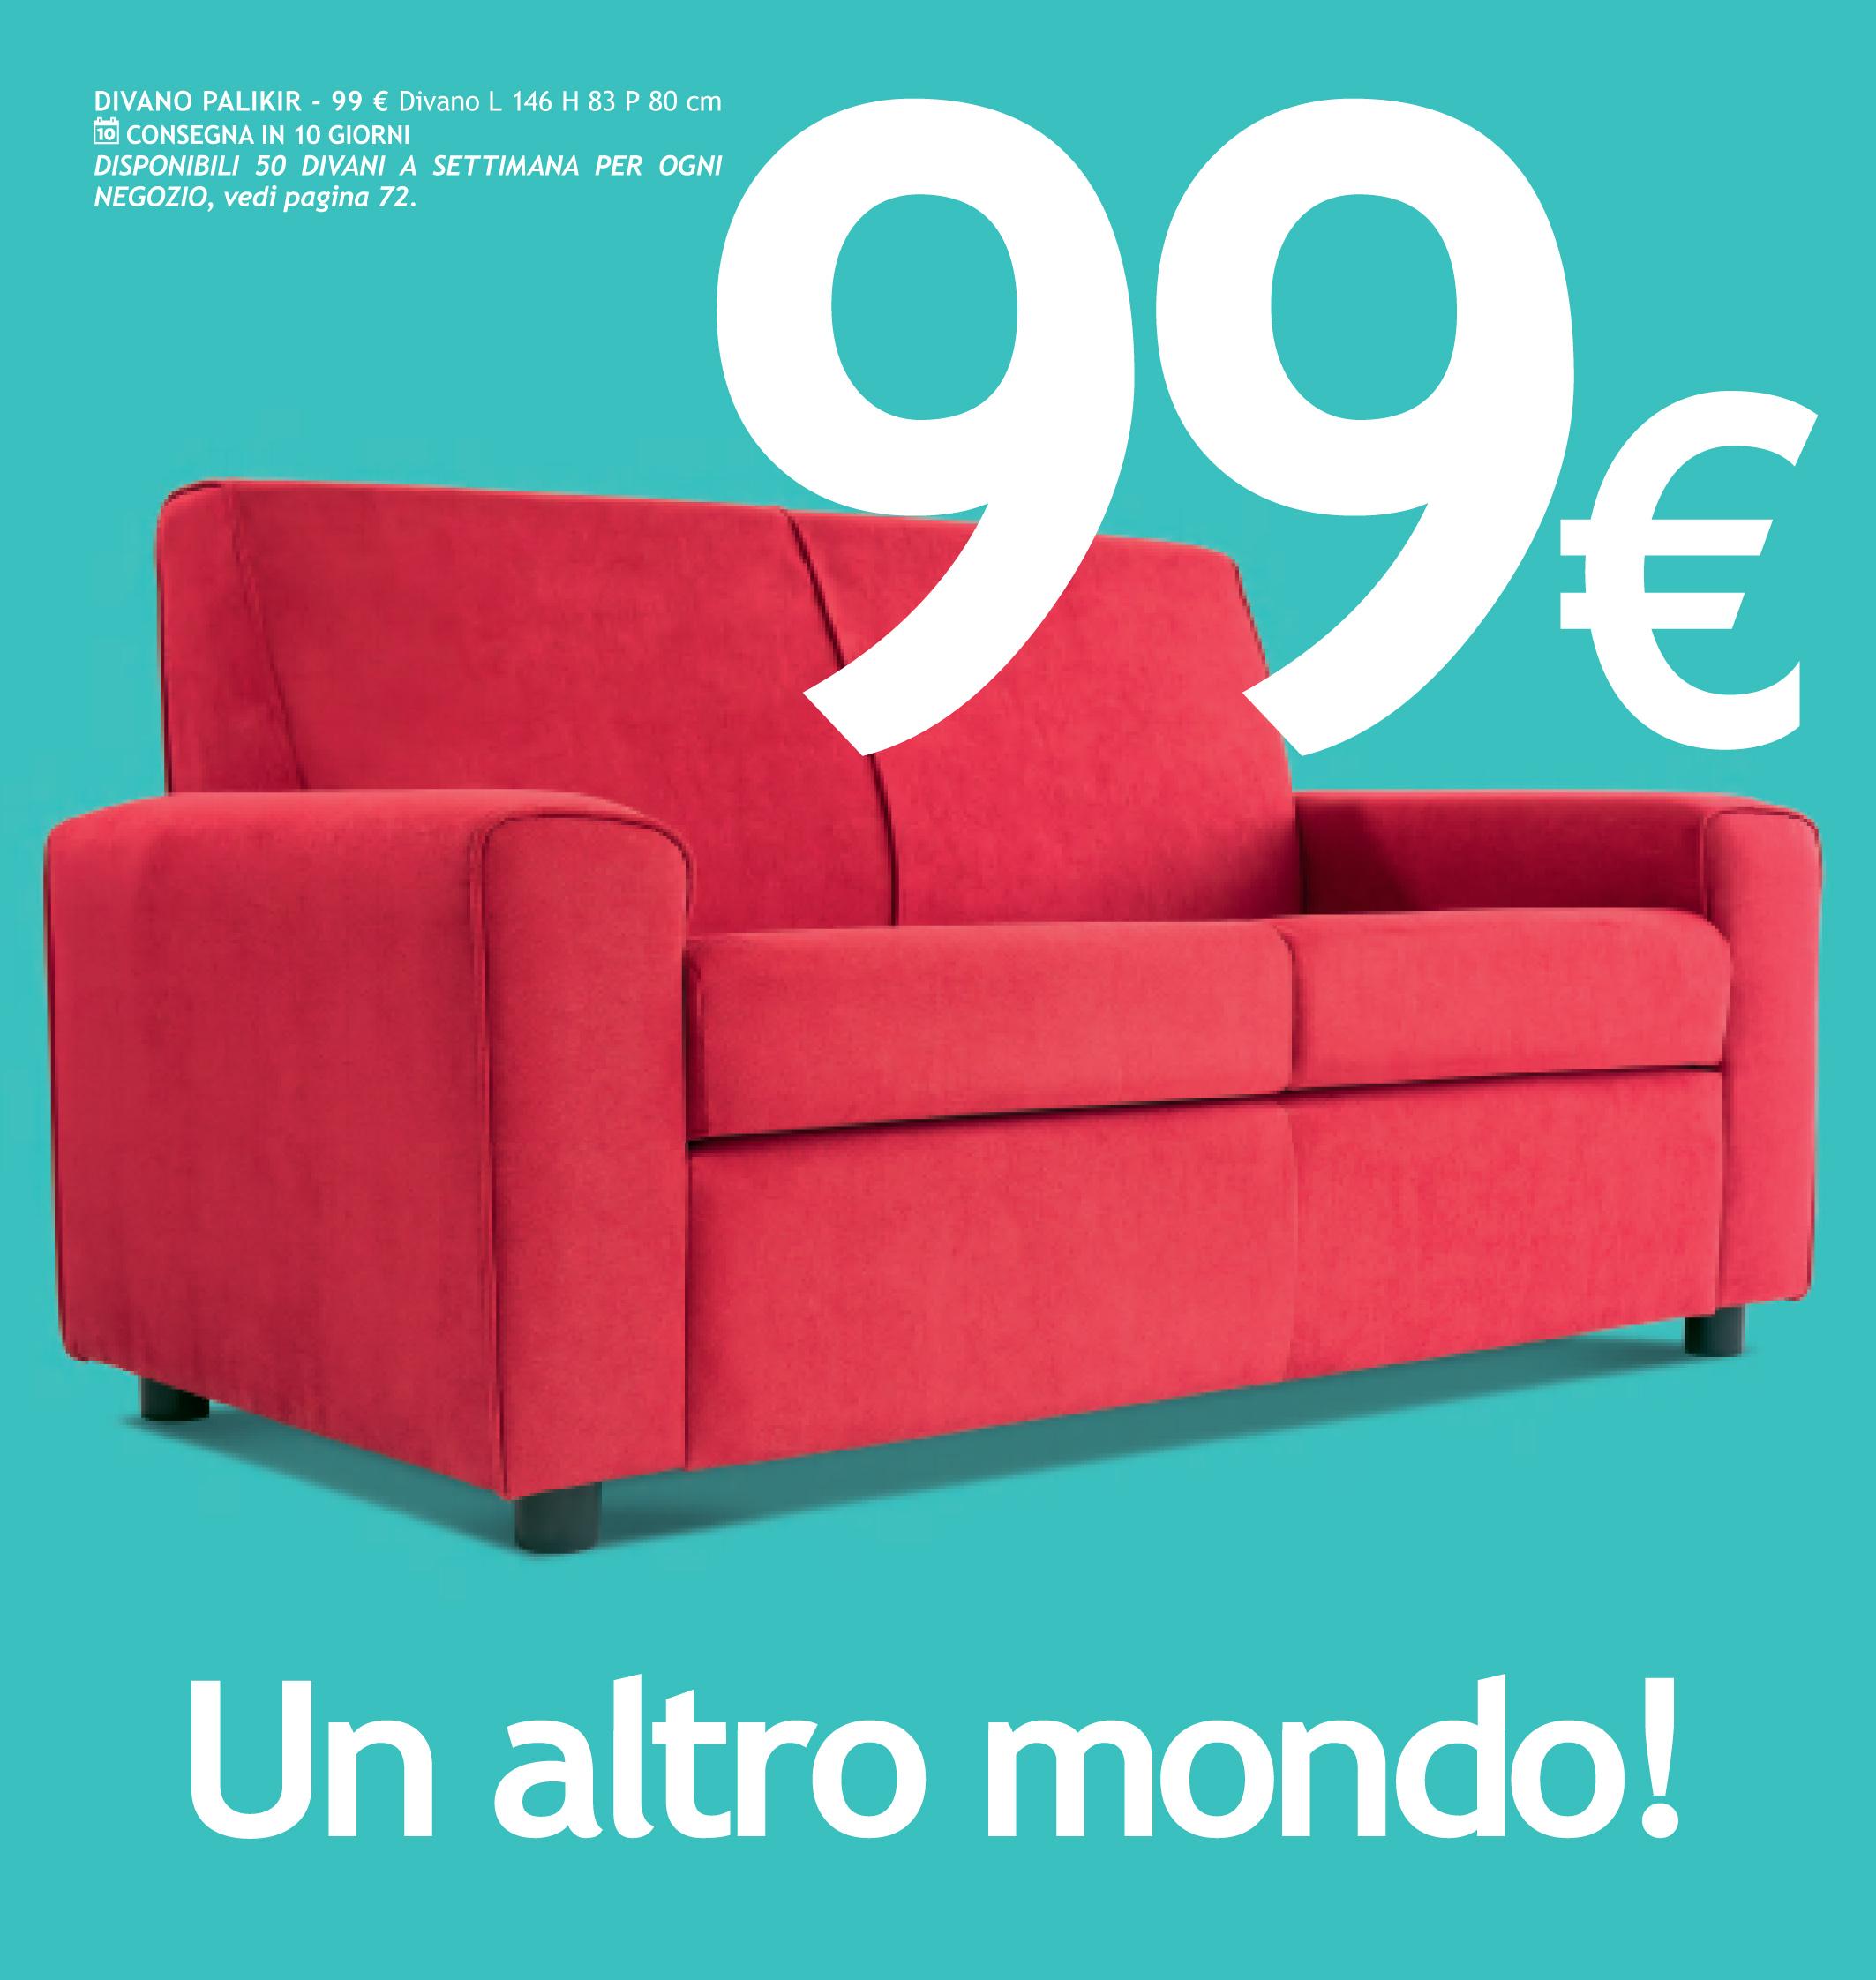 ricci casa: mobili belli, prezzi bellissimi anzi scandalosi! - news - Arredo Bagno Ricci Casa